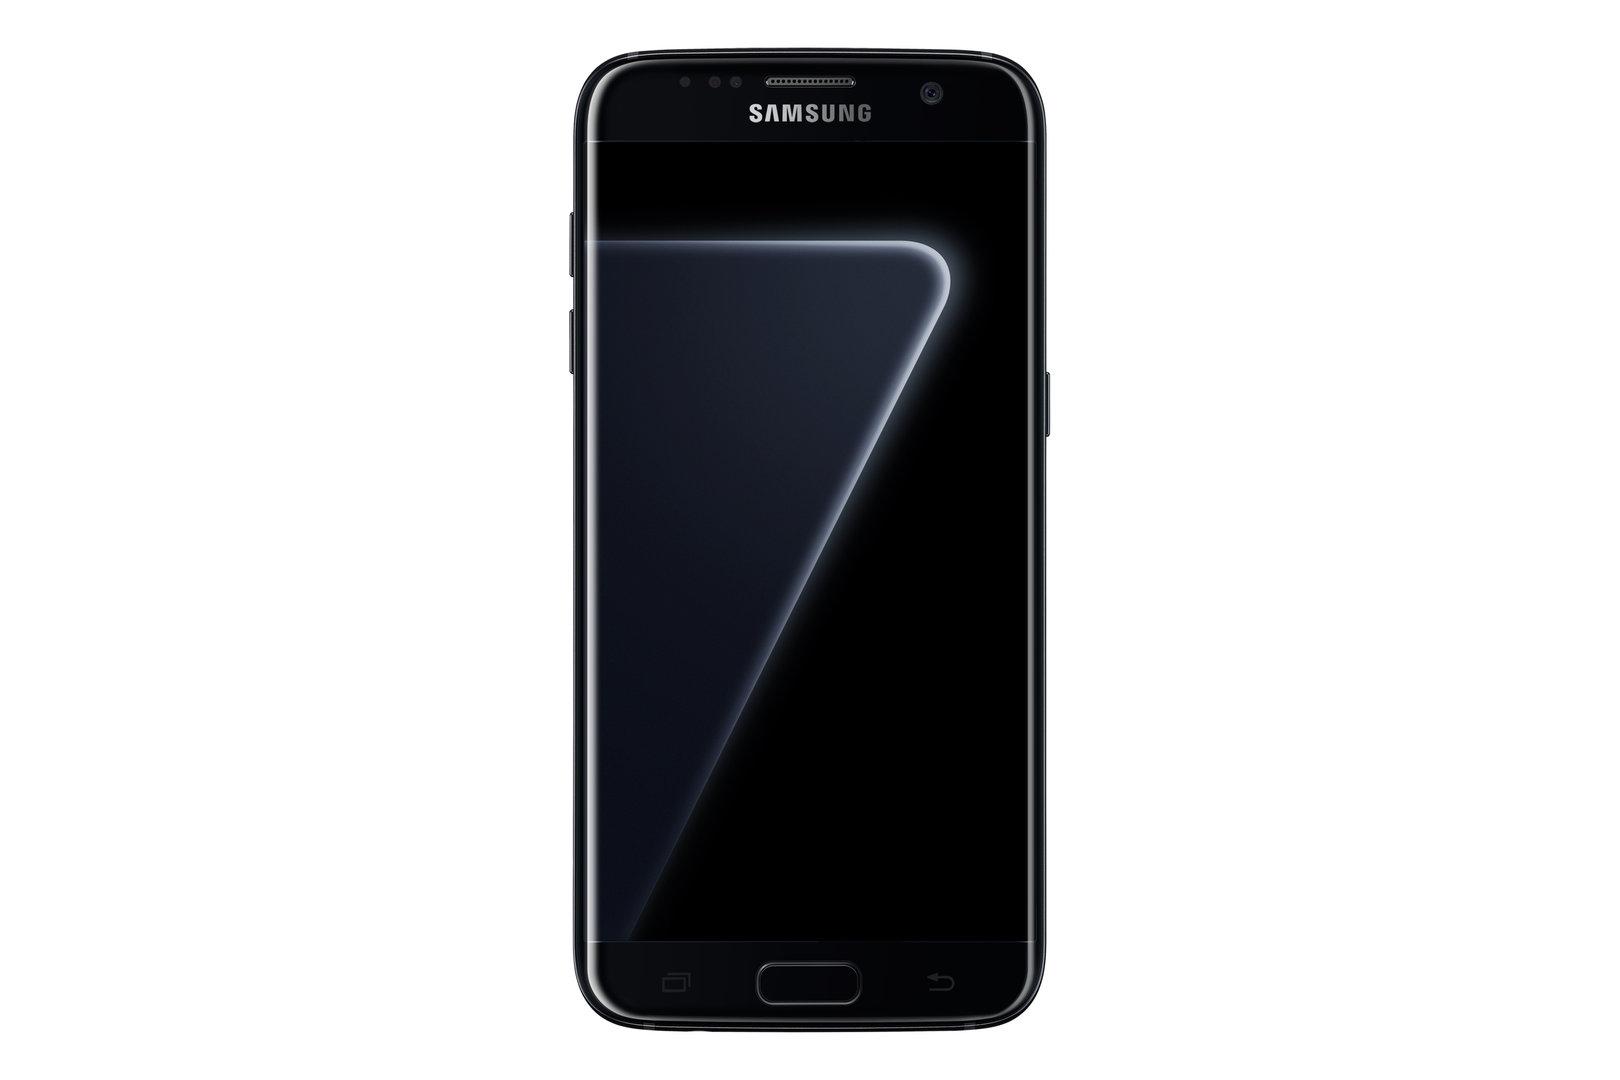 Galaxy S7 edge in Black Pearl